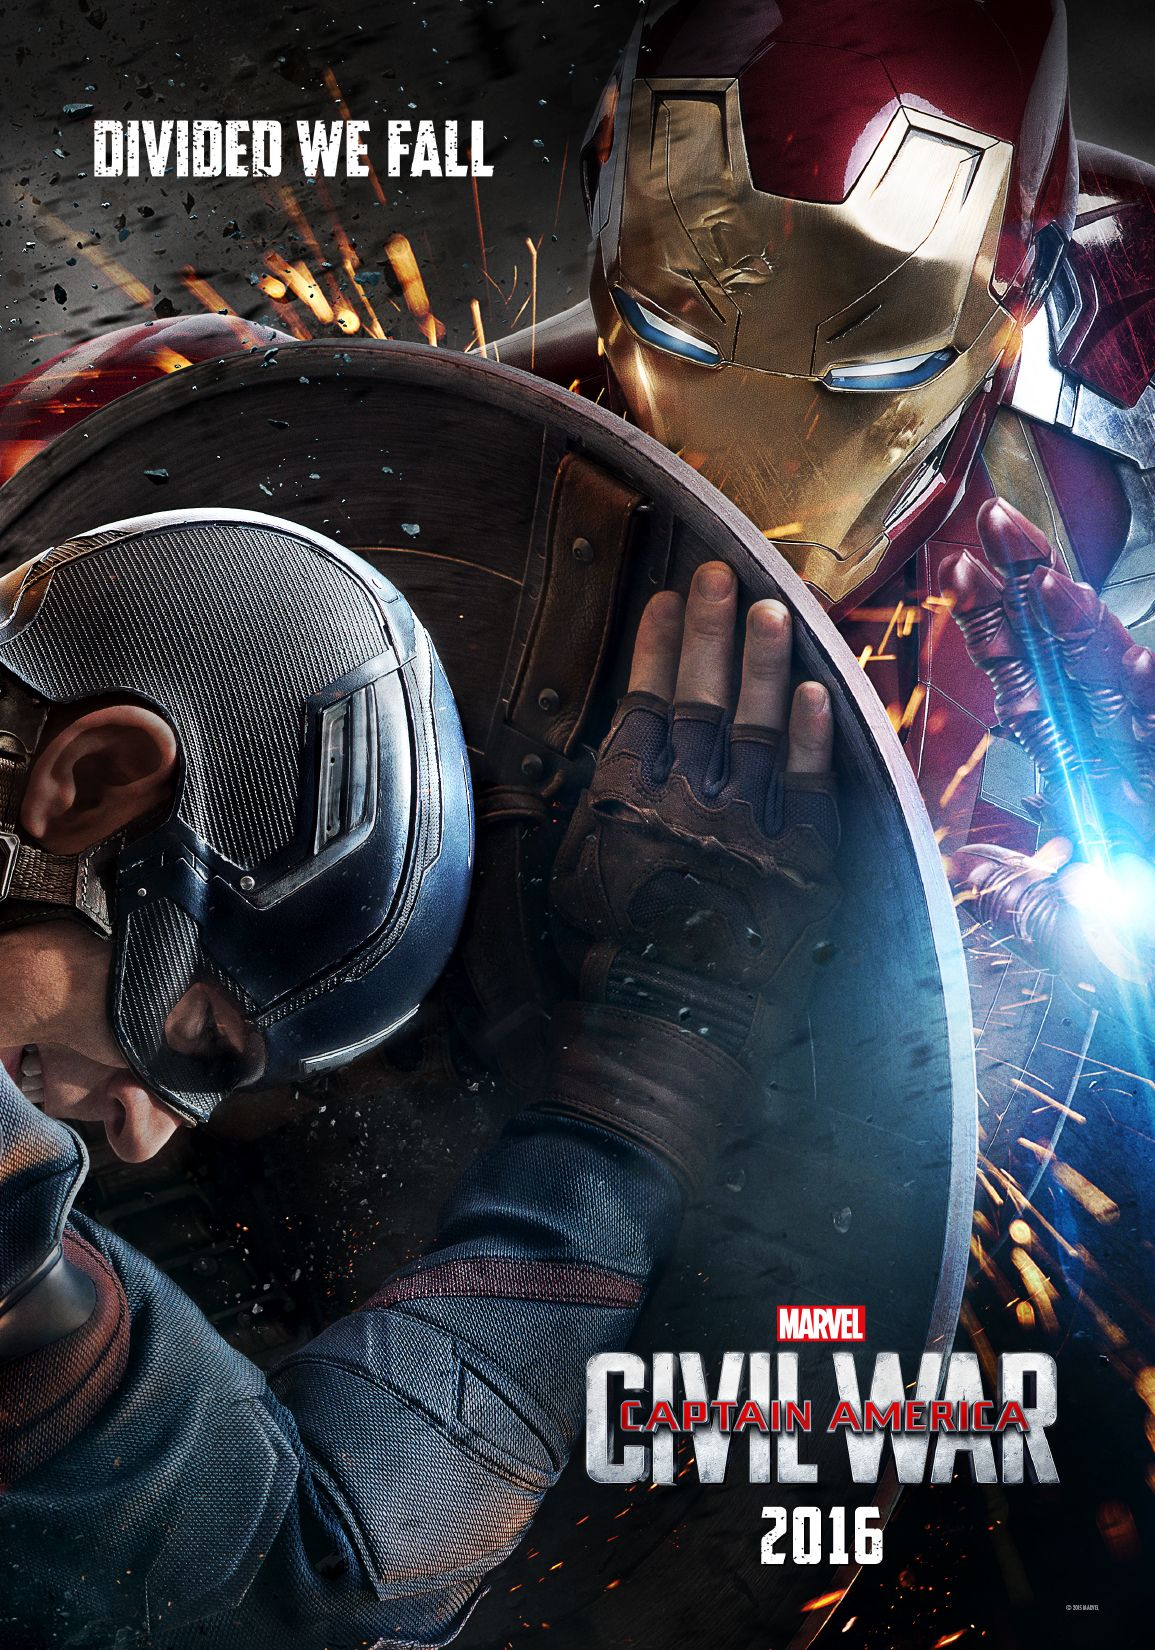 Poster Capitan America 3 Captain America Civil War Poster Captain America Civil War Movie Marvel Captain America Civil War